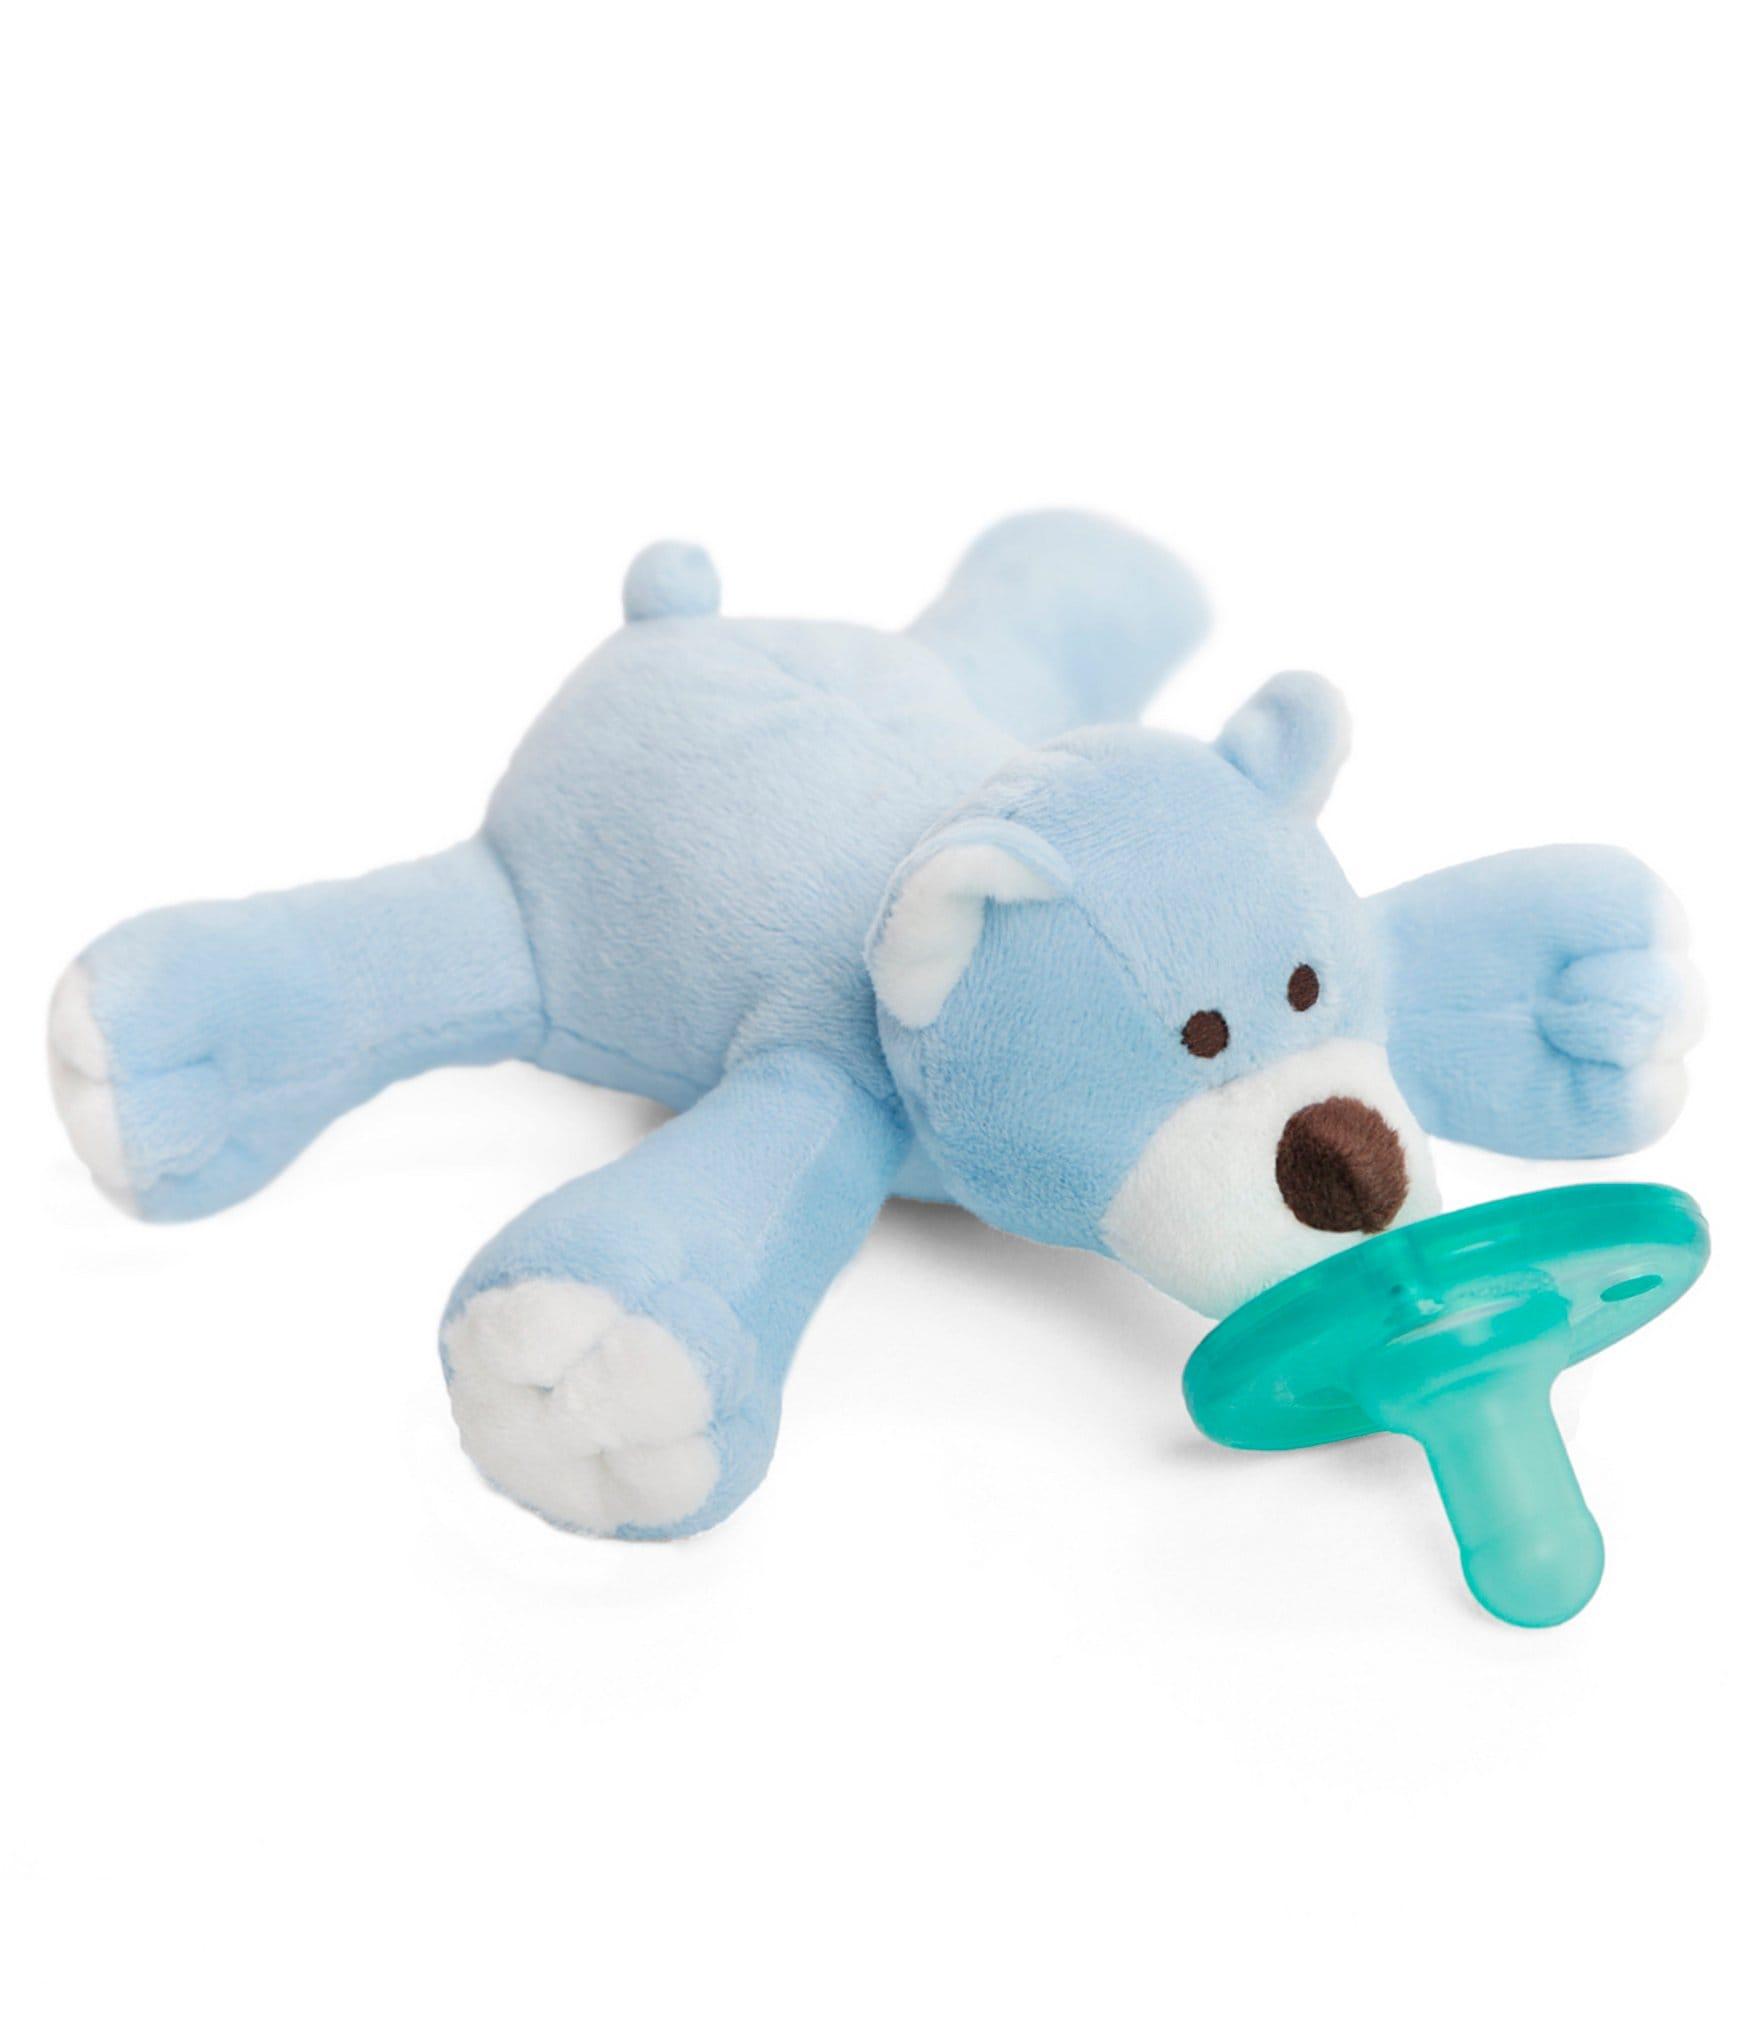 Toys & Plush | Dillards